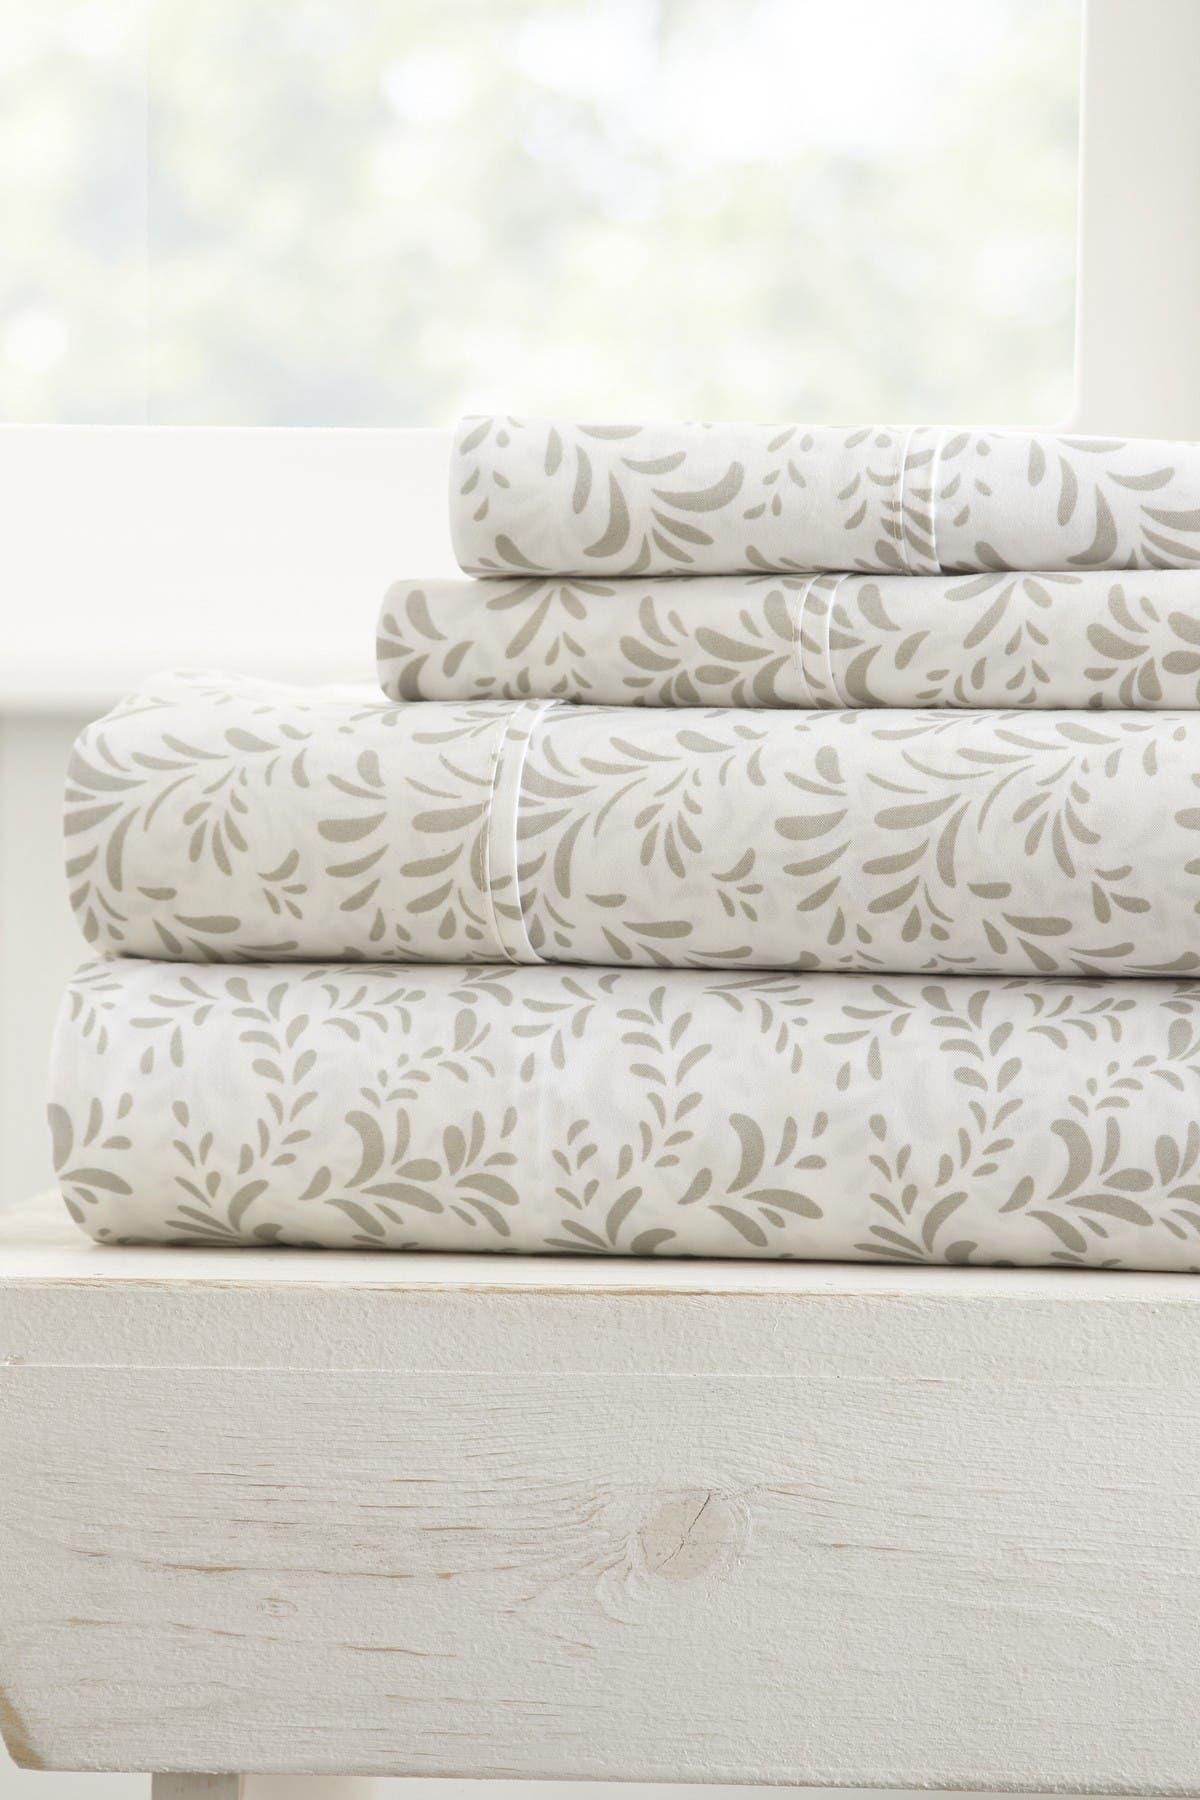 Image of IENJOY HOME The Home Spun Premium Ultra Burst of Vines Pattern 4-Piece King Bed Sheet Set - Gray